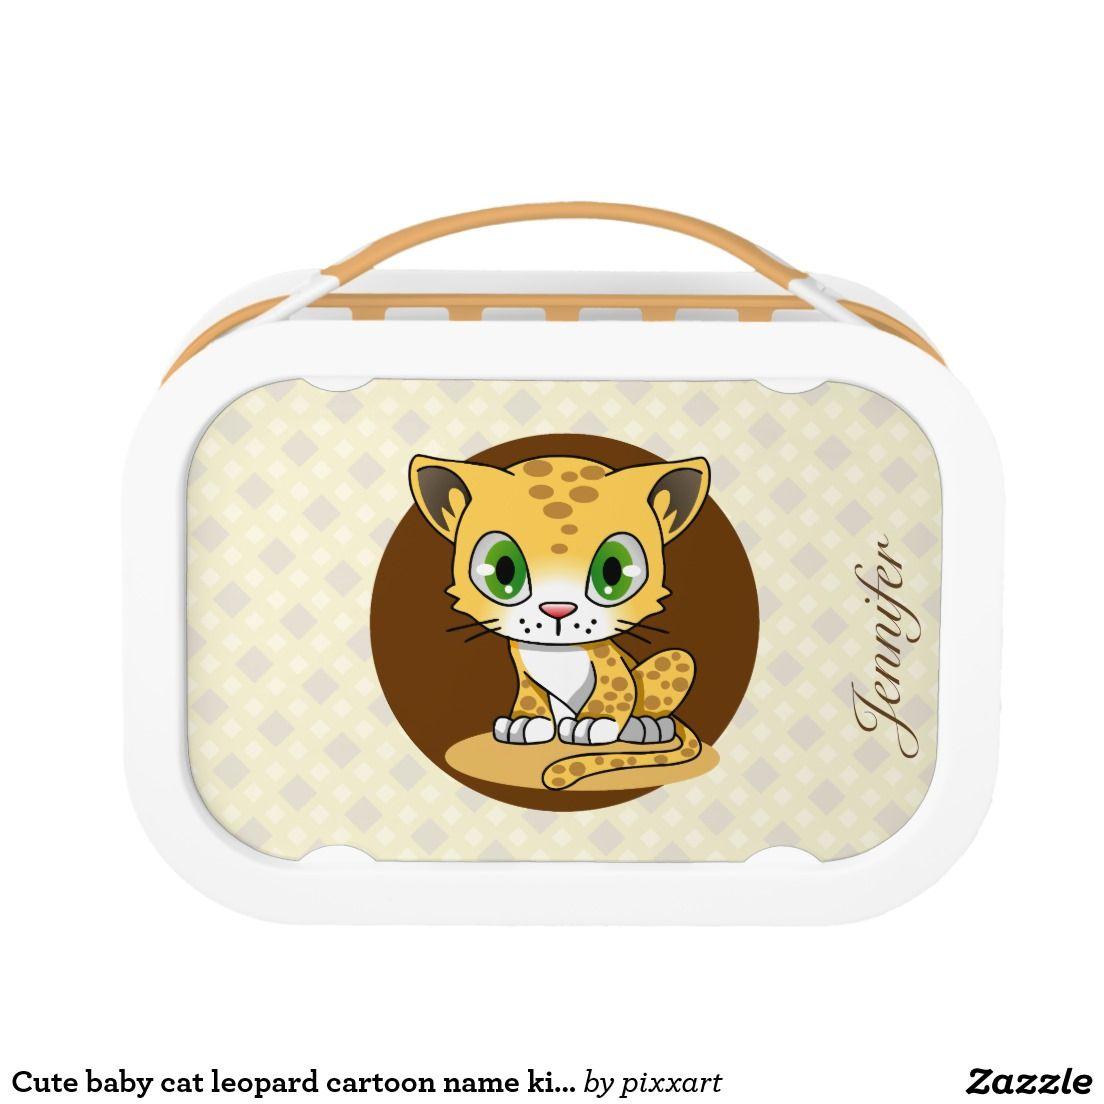 Cute Baby Cat Leopard Cartoon Name Kids Lunchbox Lunch Box Cute Baby Cats Kids Lunchbox